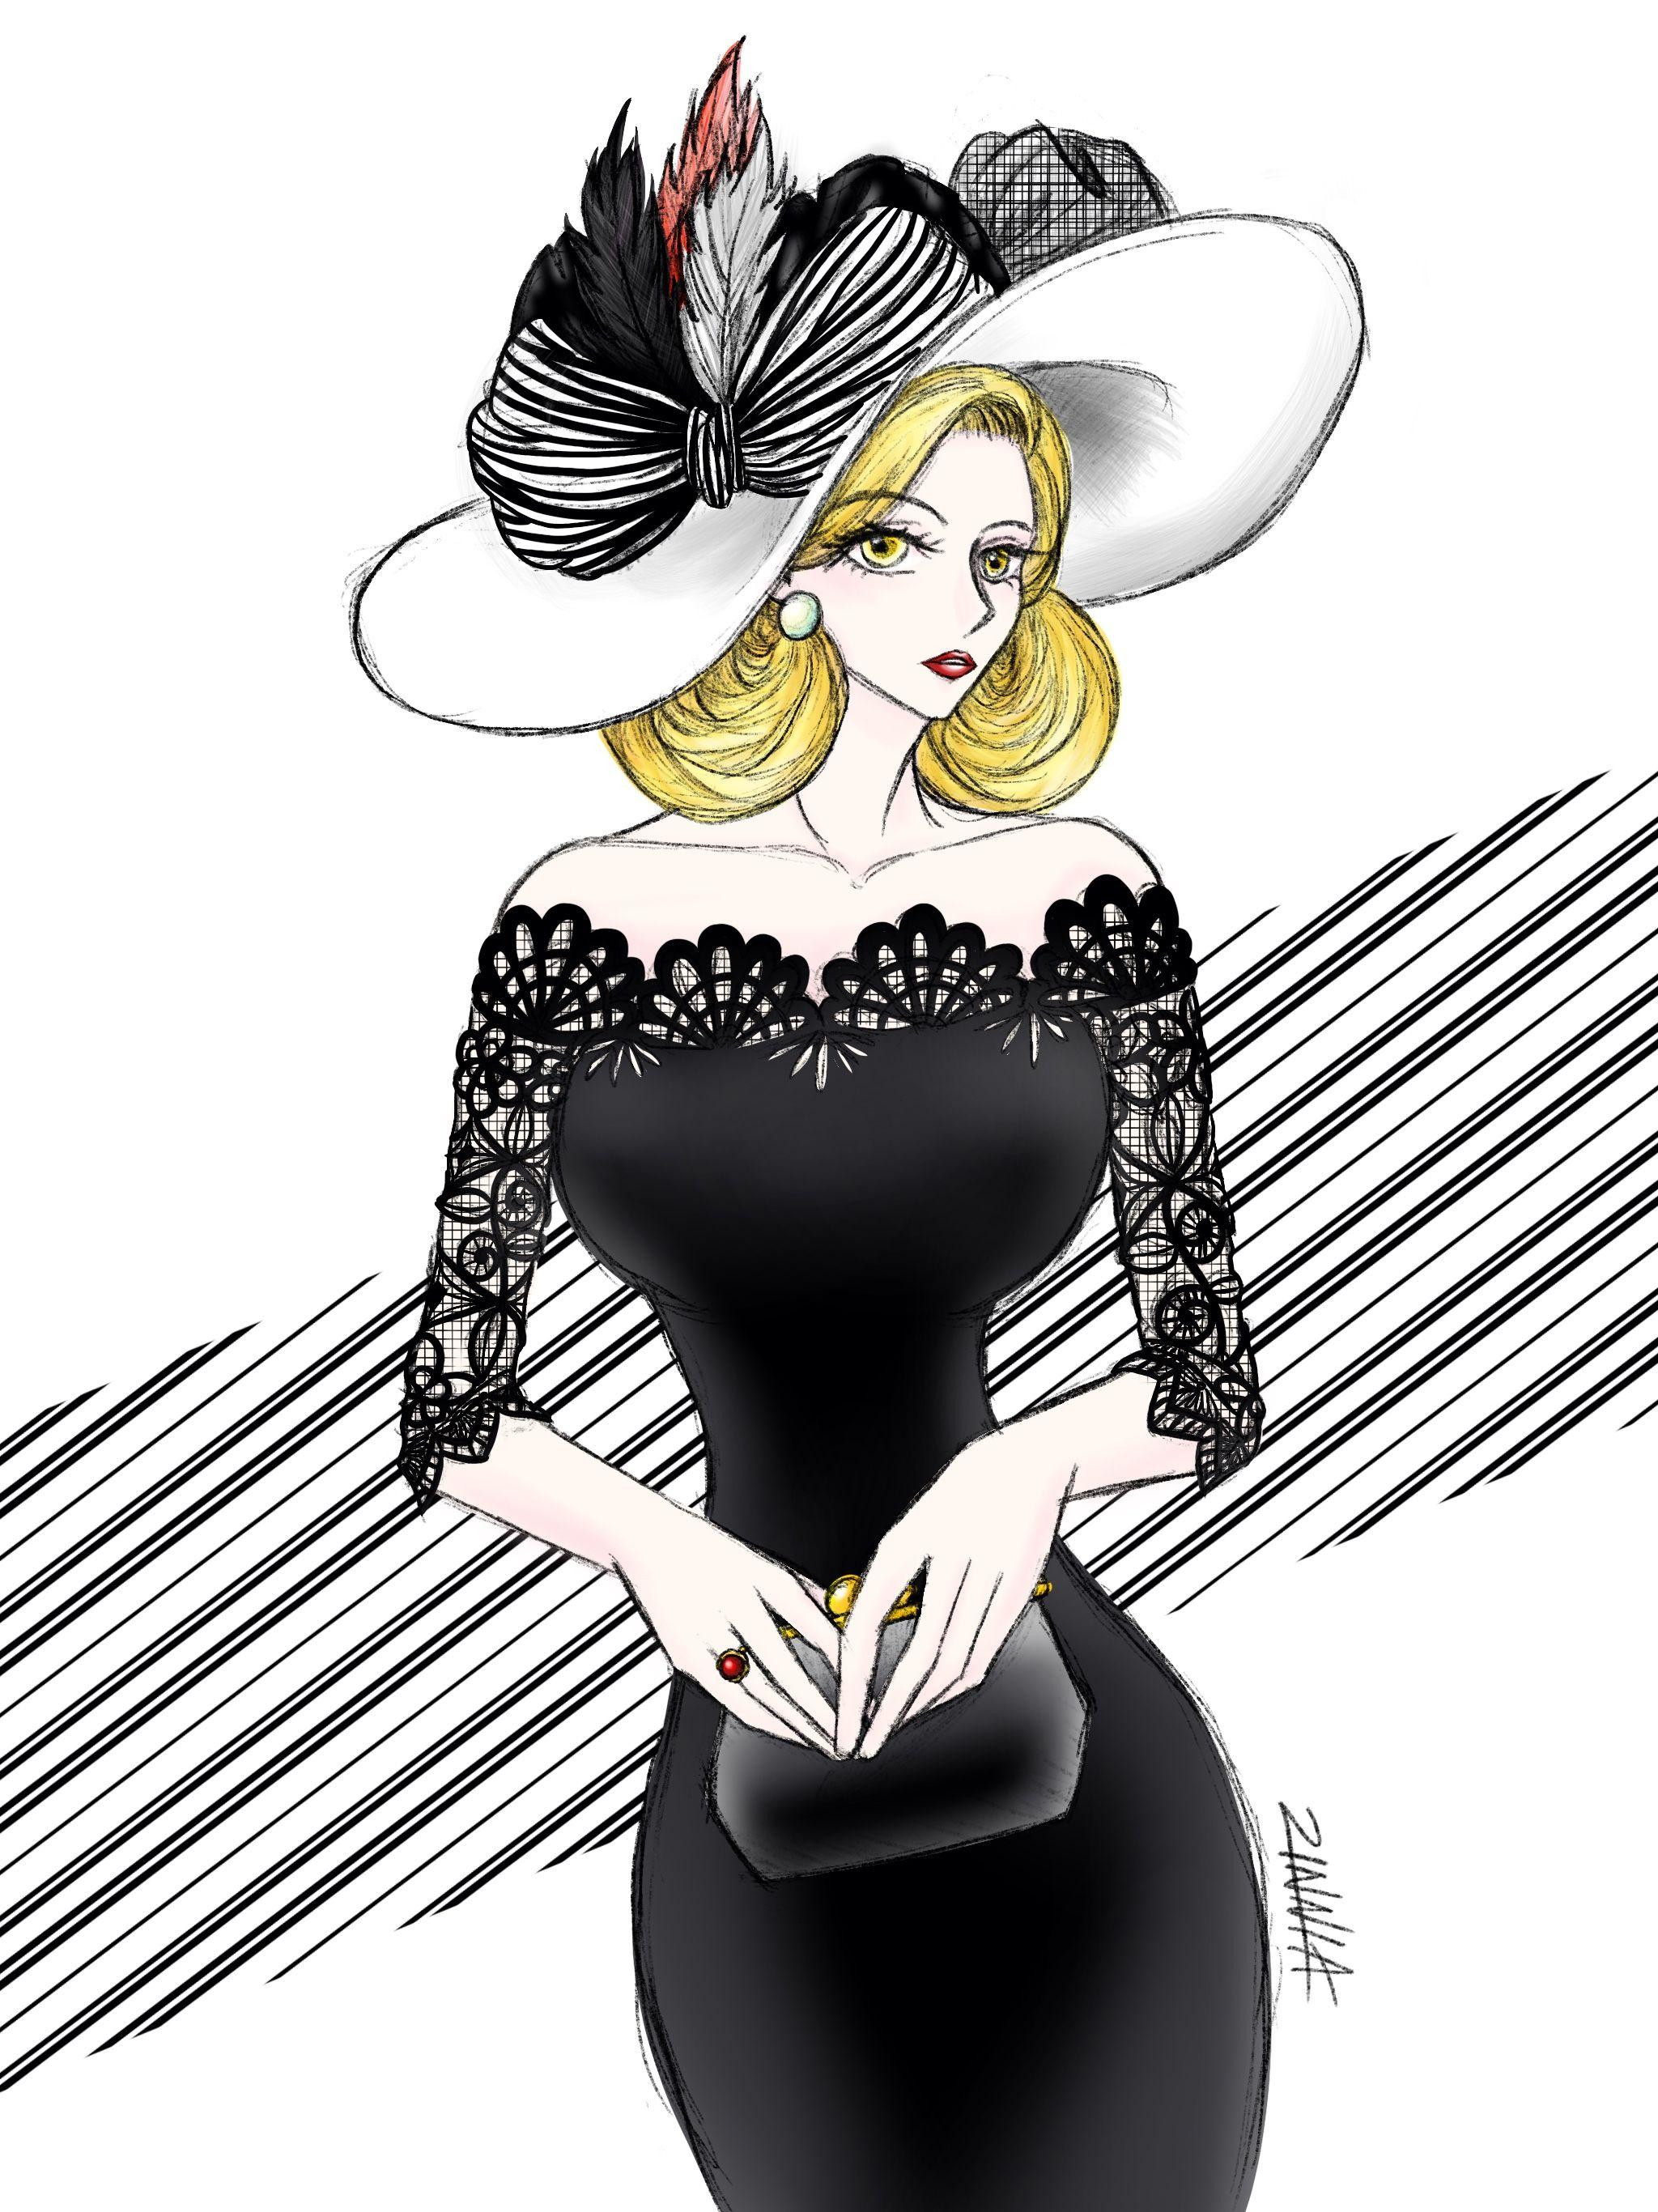 Lady illustration using iPad Pro Procreate app. Watch